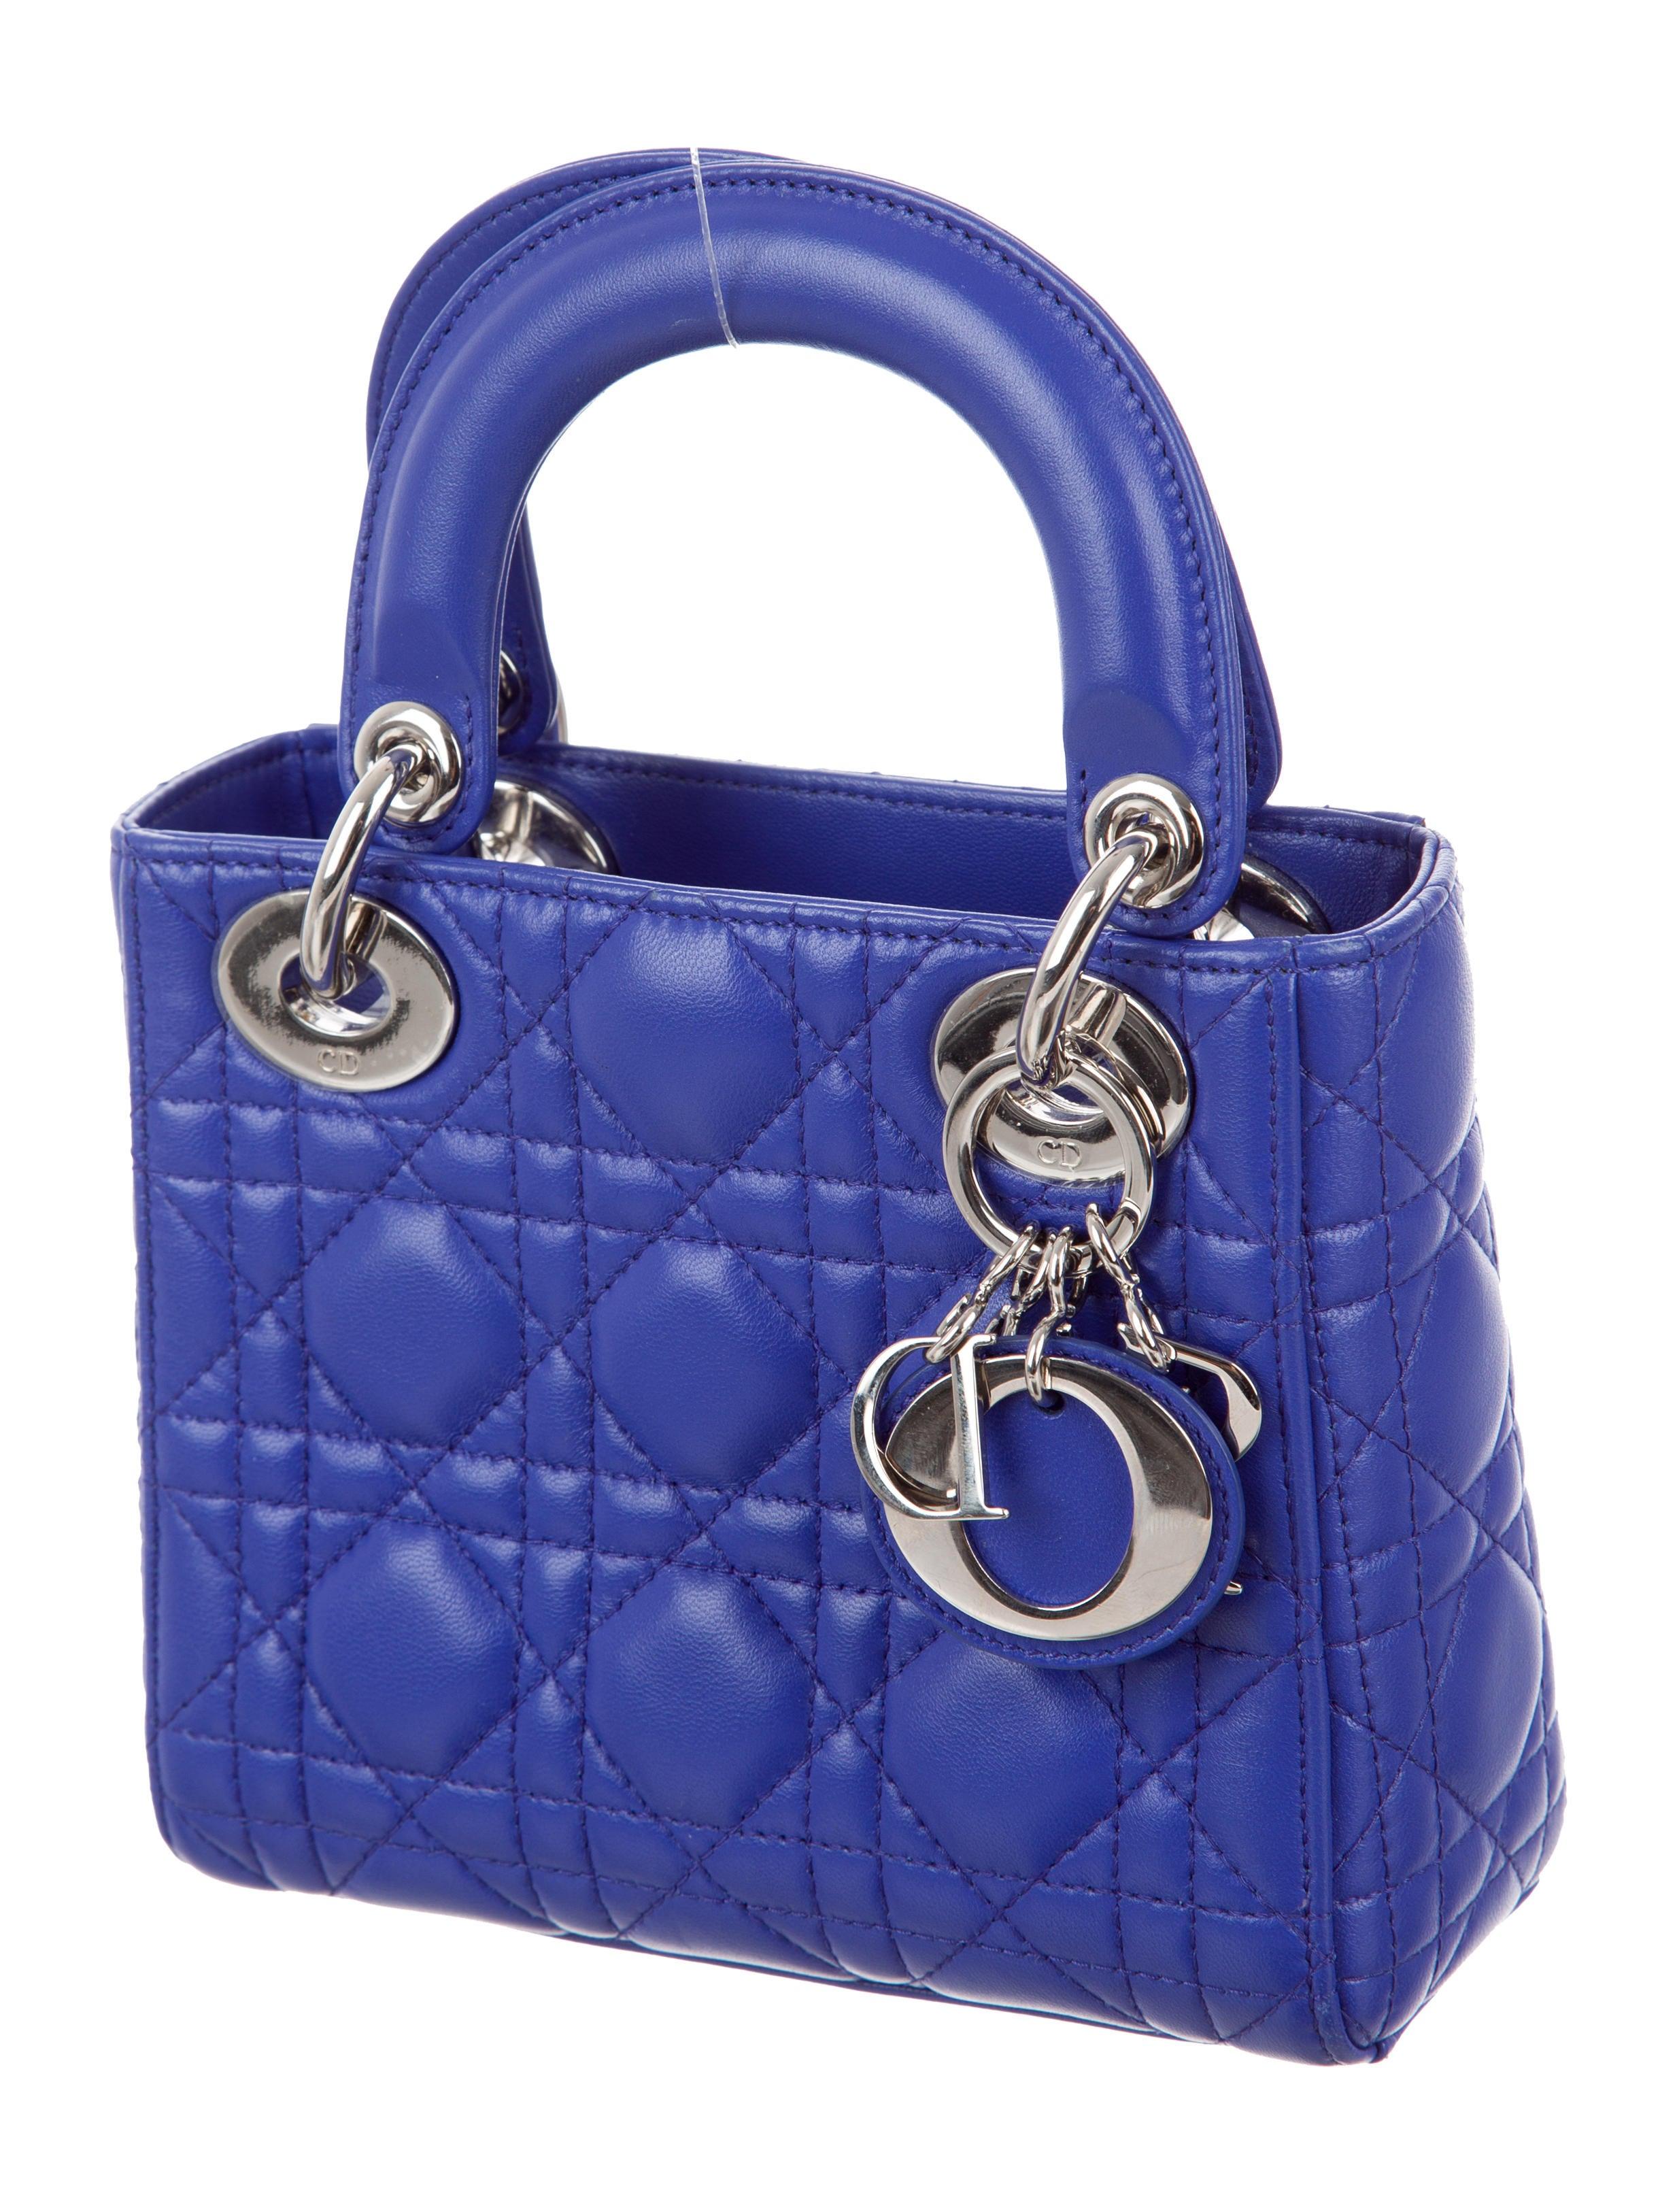 christian dior mini lady dior bag handbags chr60359 the realreal. Black Bedroom Furniture Sets. Home Design Ideas